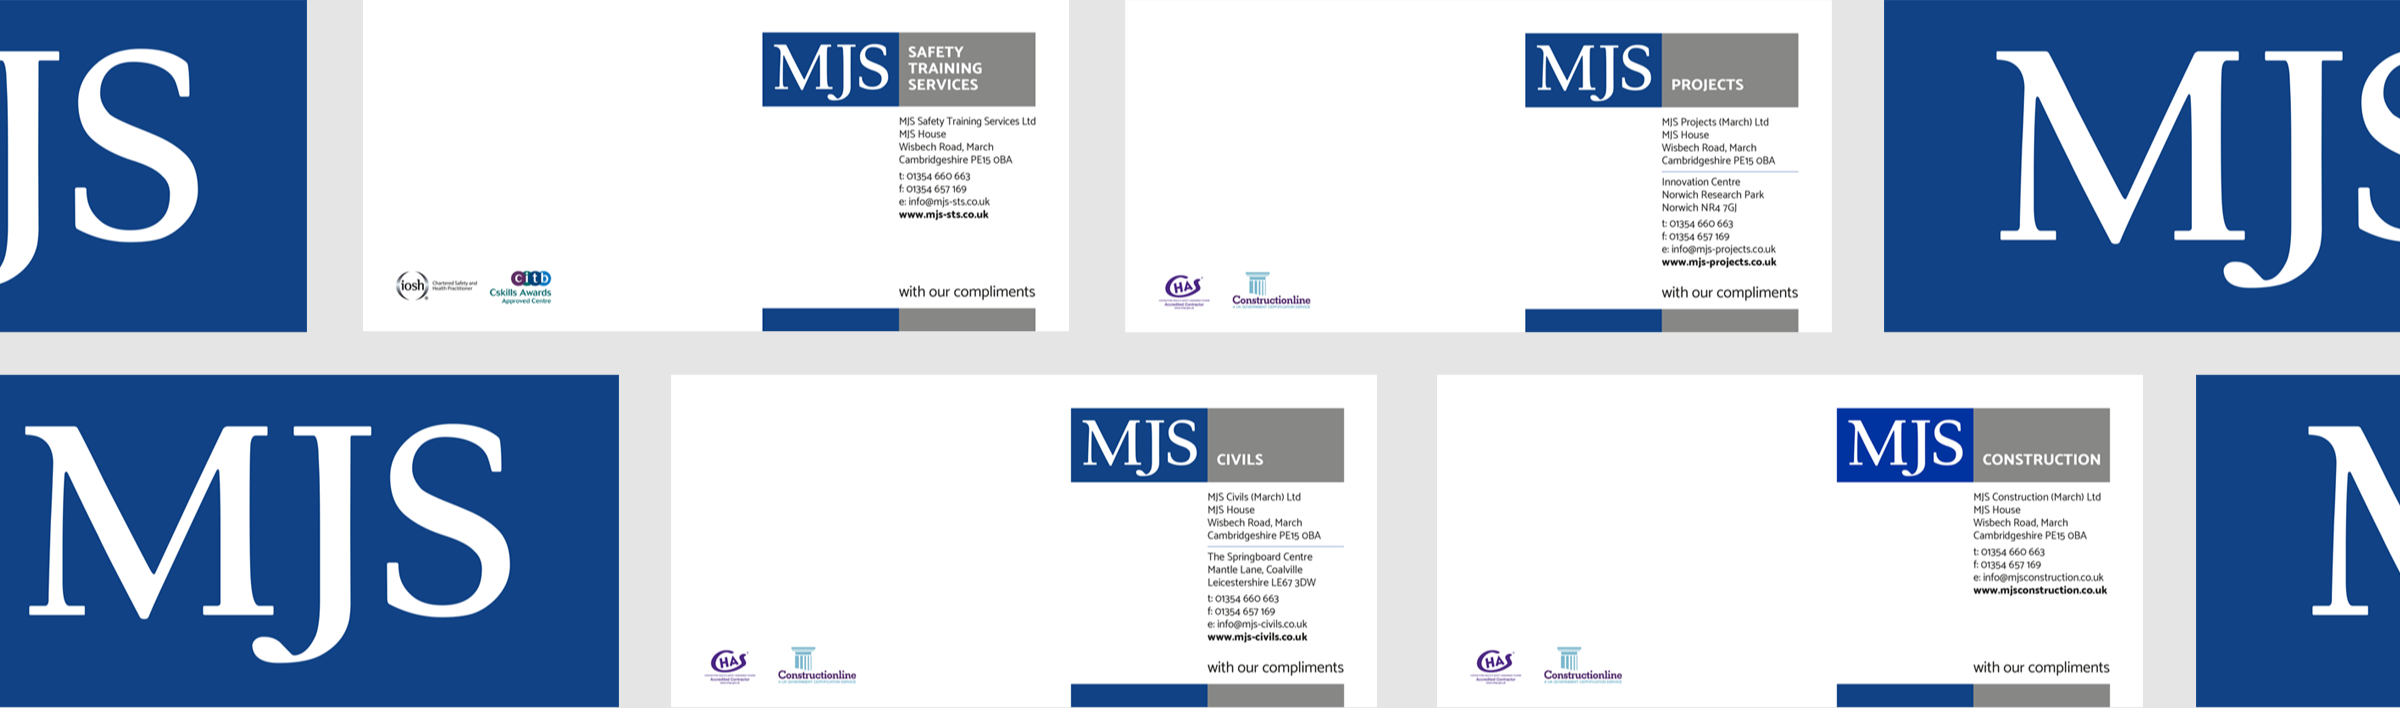 MJS printed literature